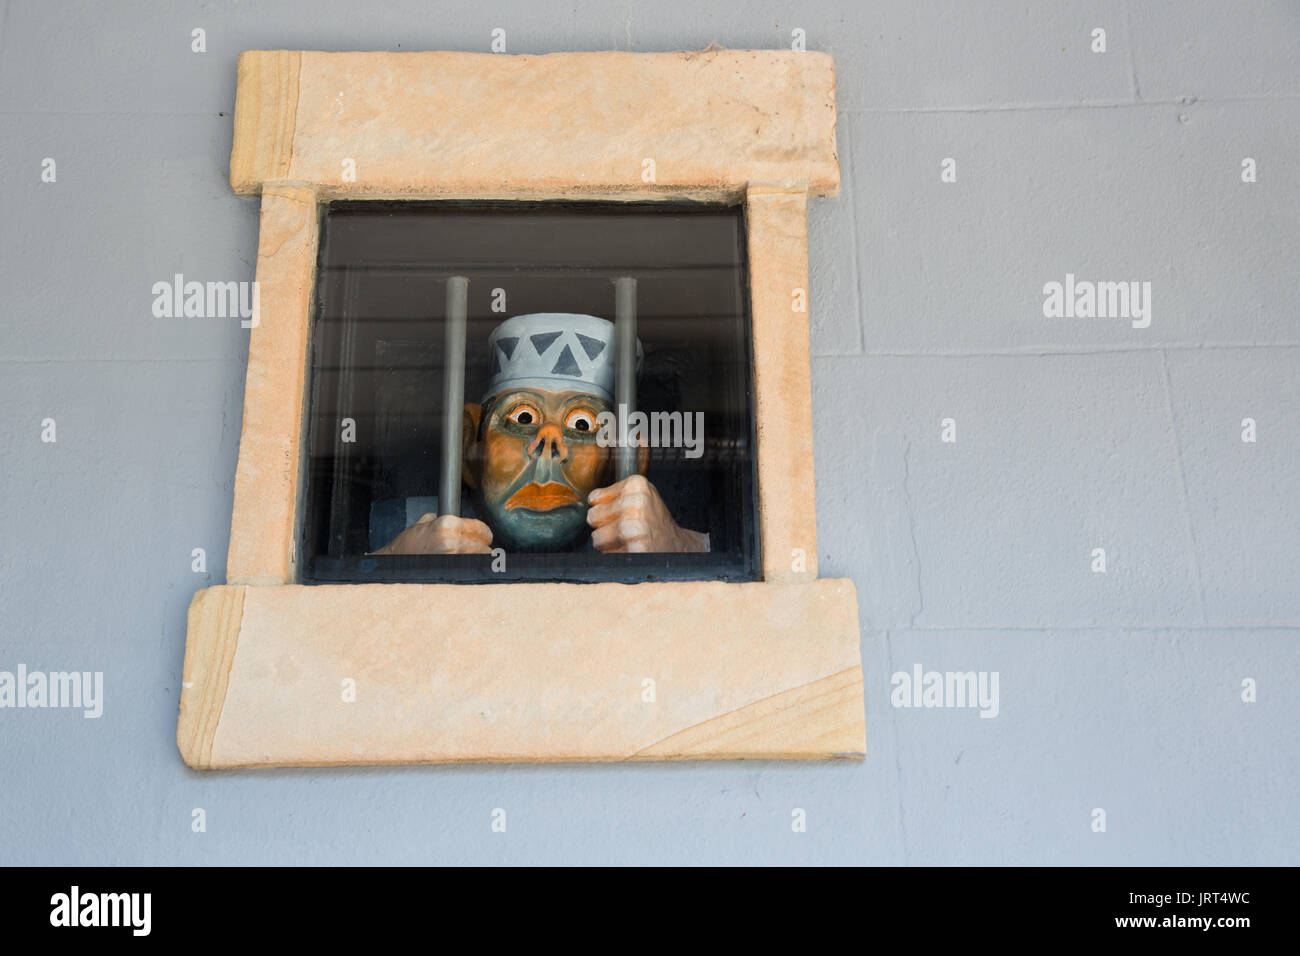 street-art-of-a-comical-prisoner-on-the-